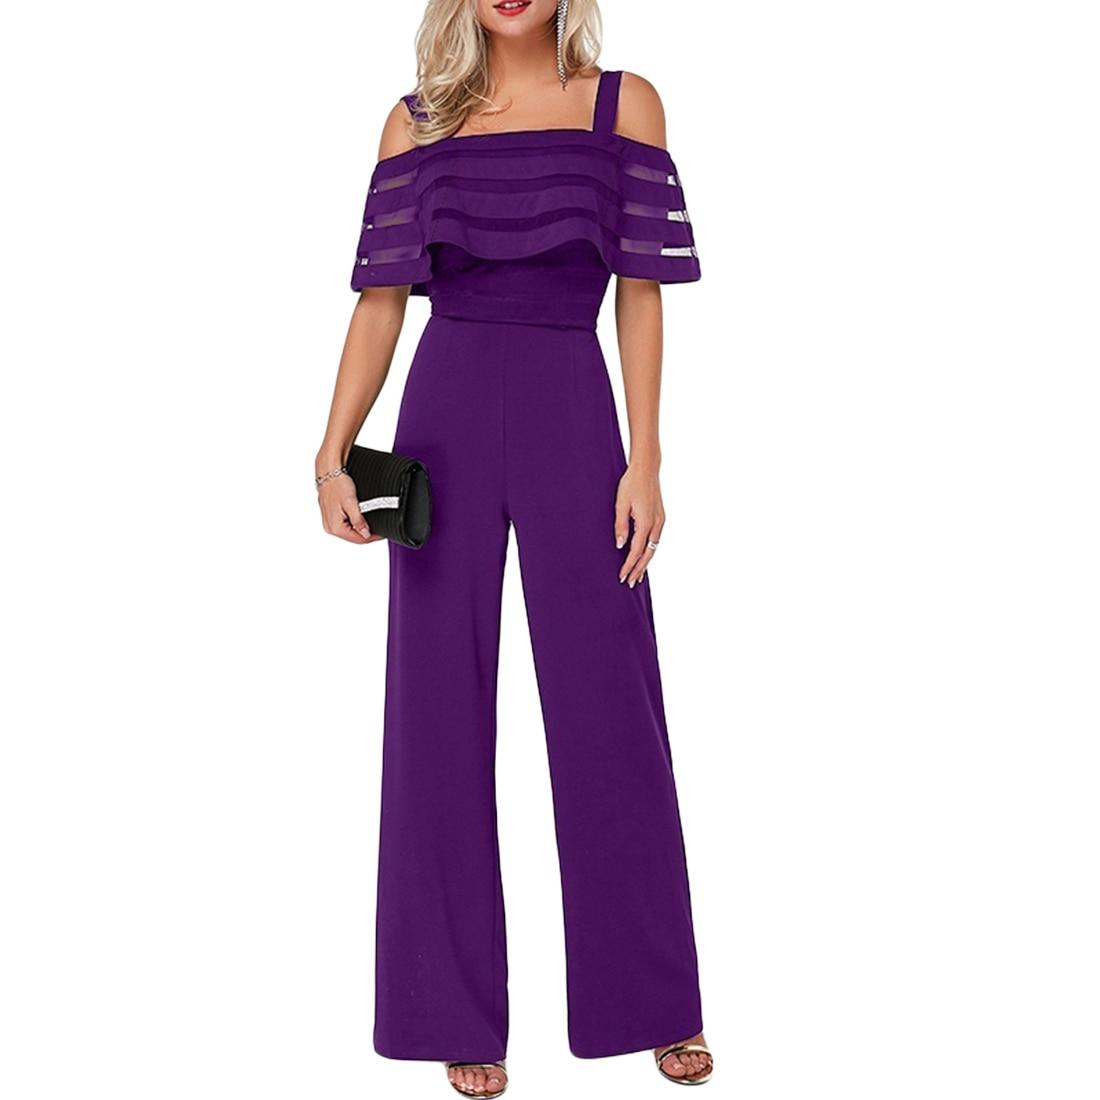 Summer Romper Jumpsuit Overalls Leg-Trousers Clubwear Mesh Off-Shoulder Plus-Size Sexy Women